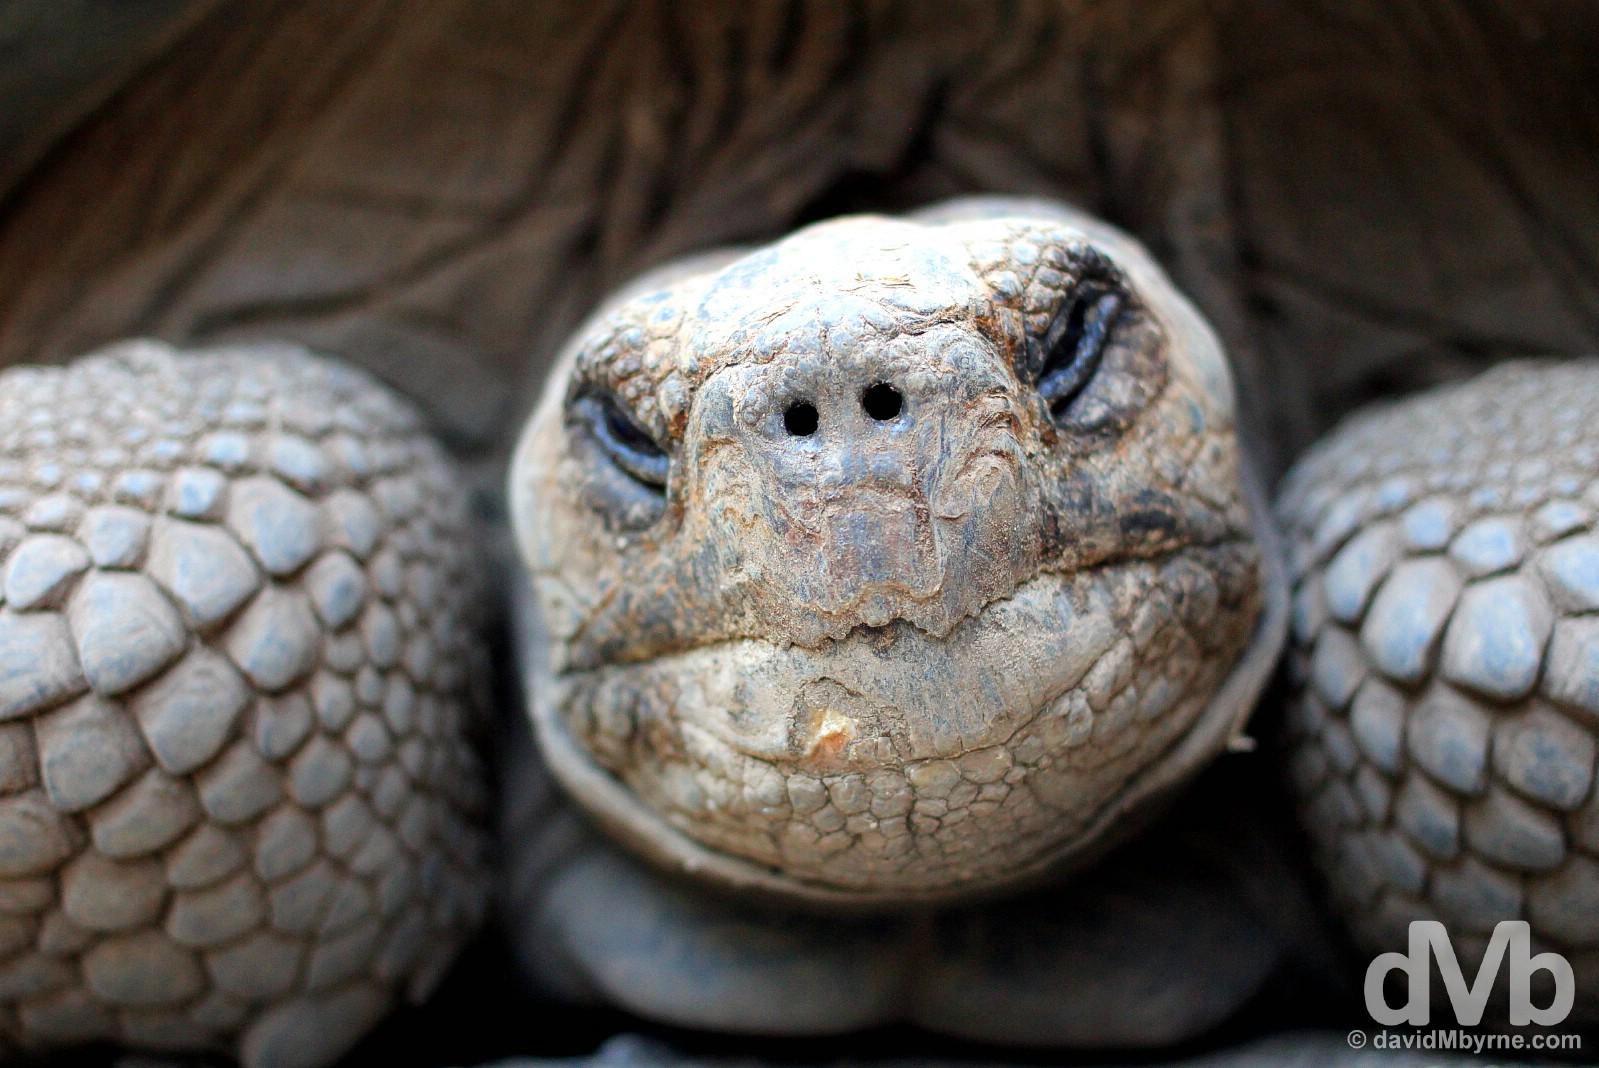 A resident tortoise in the Tortoise Breeding Centre on Isla Isabela, Galapagos, Ecuador. July 19, 2015.